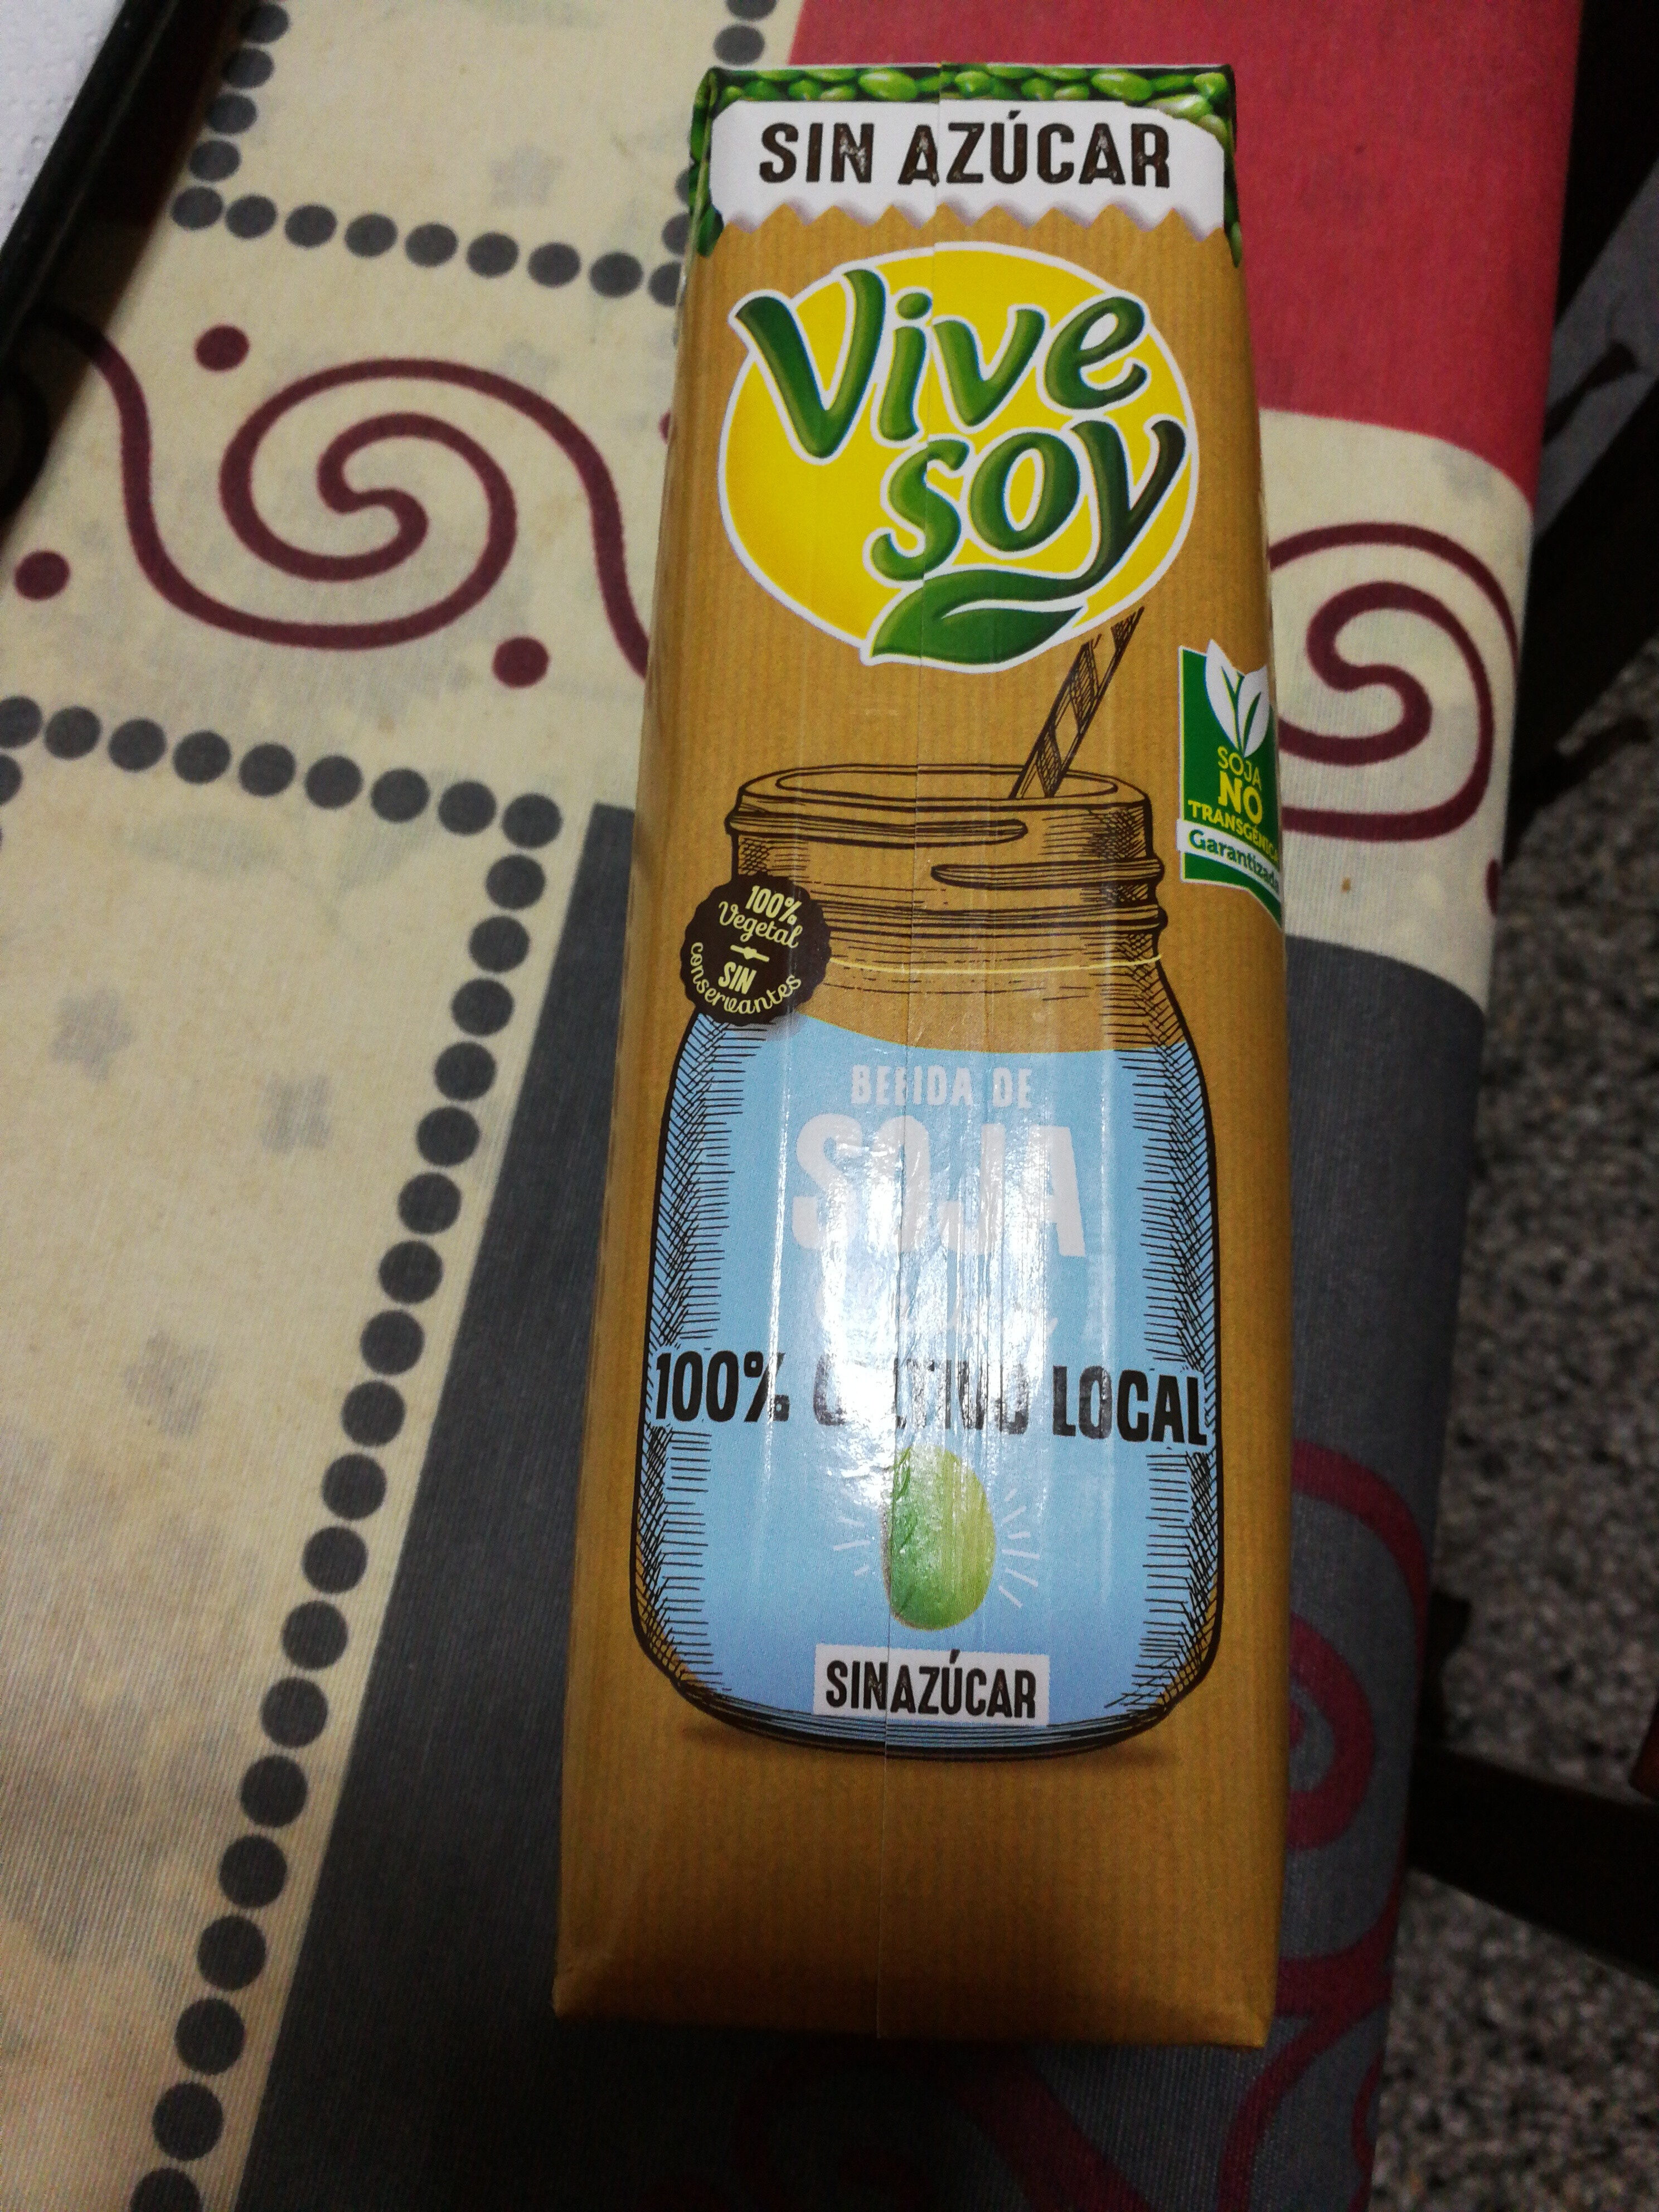 vivesoy soja sin azucar - Produit - es